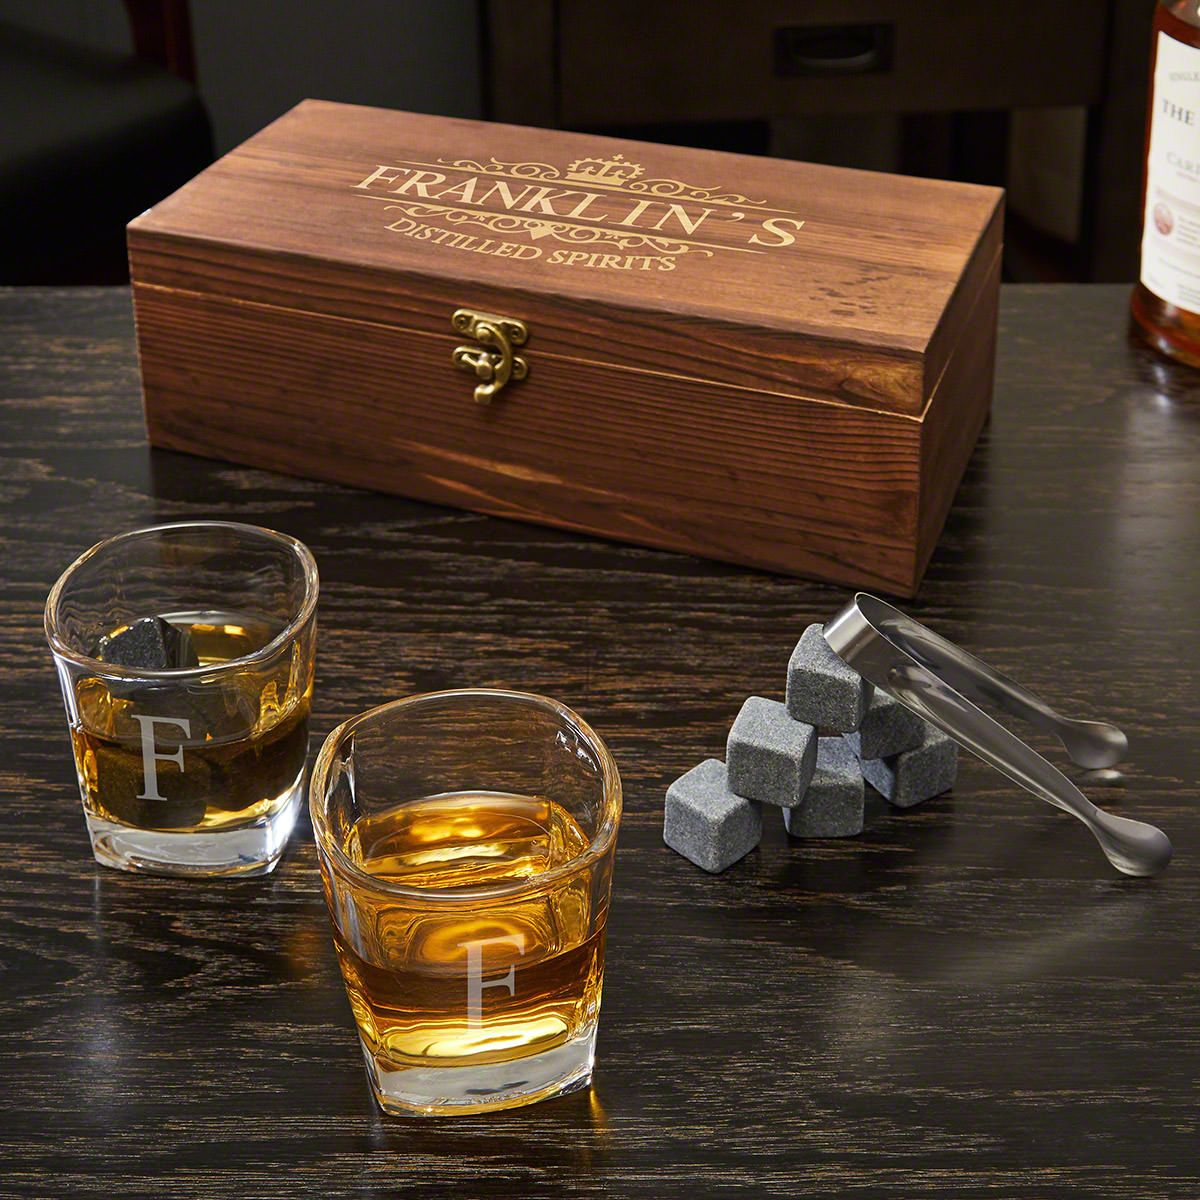 Kensington Personalized Shot Glasses and Whiskey Stones Gift Set